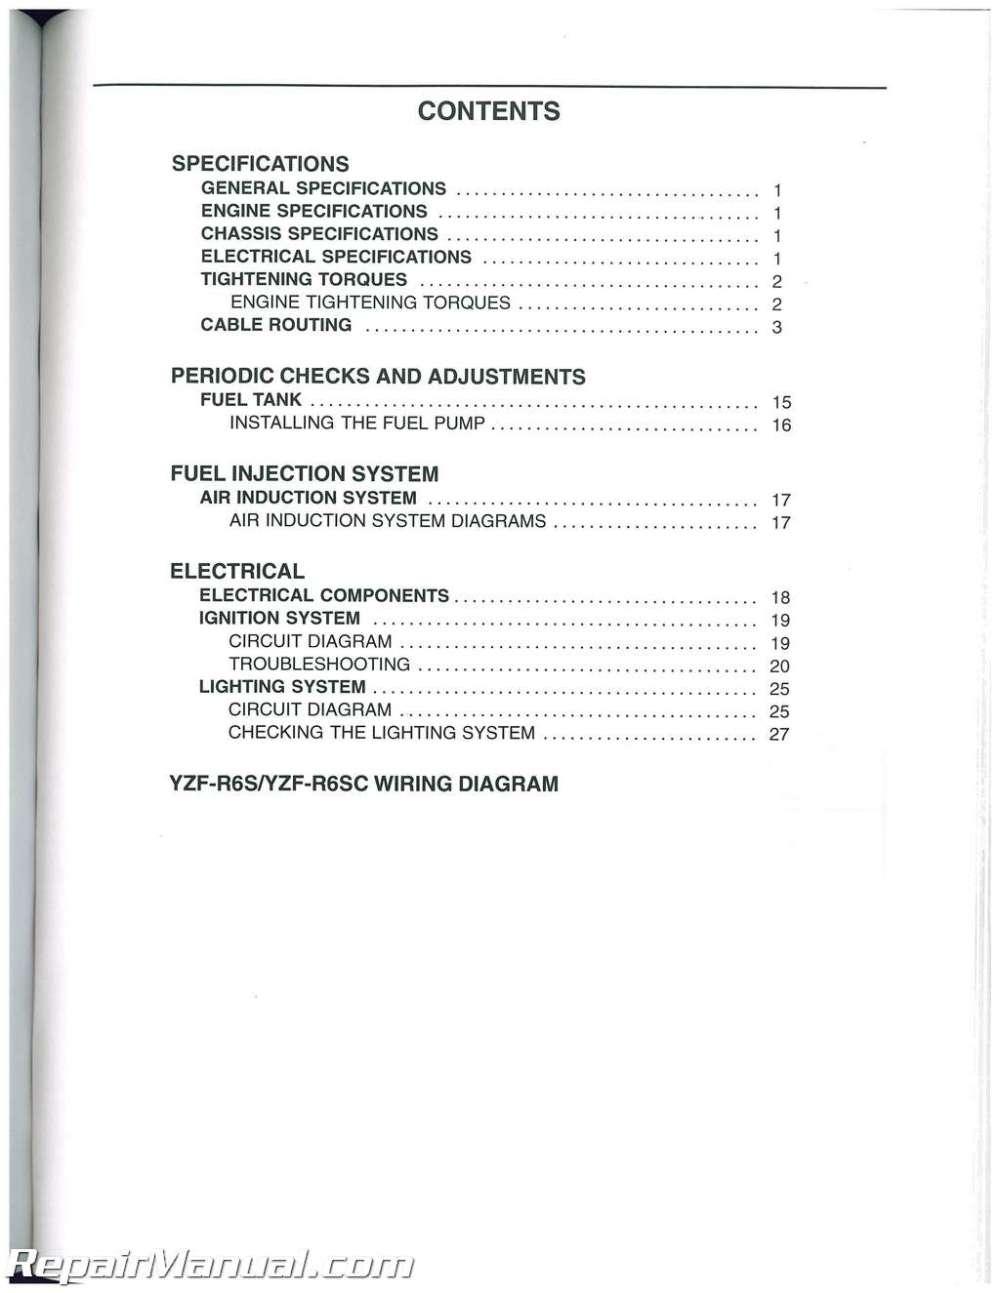 medium resolution of 2005 yamaha r6 wiring diagram ignition